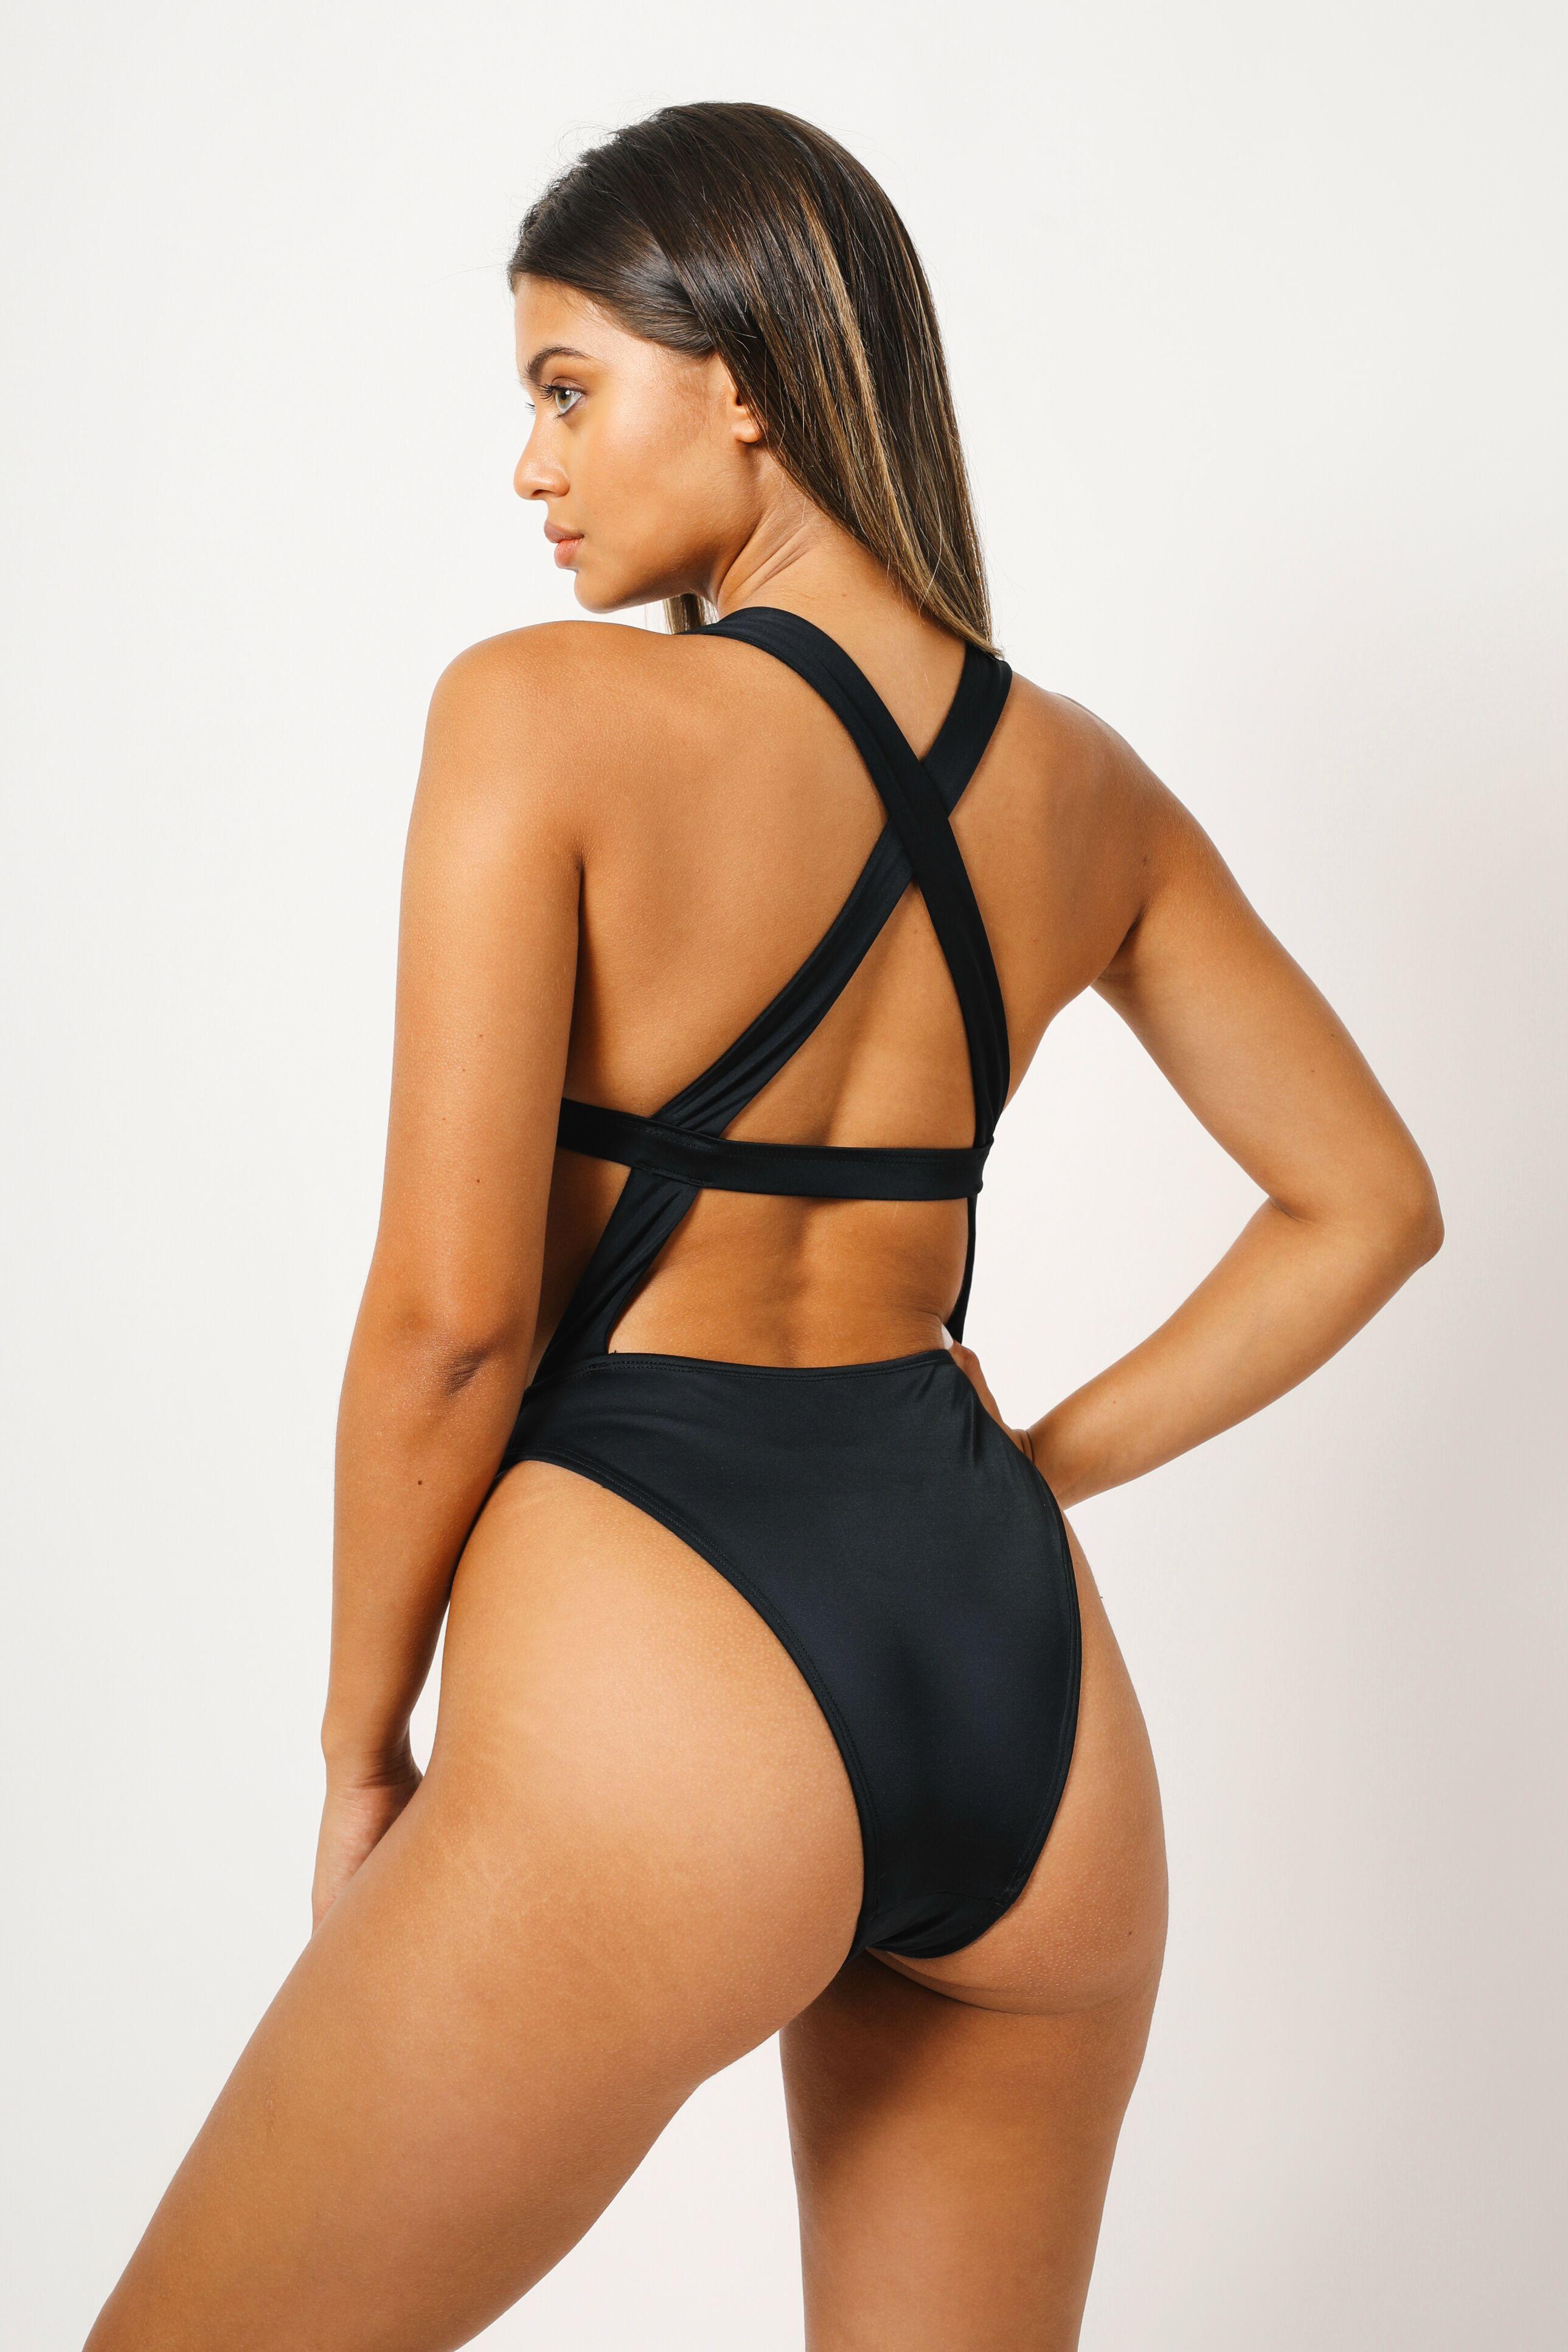 swimwear kaohs swimwear ishine365 shop ishine365 black one piece swimsuit strappy one piece swimwear cut out one piece